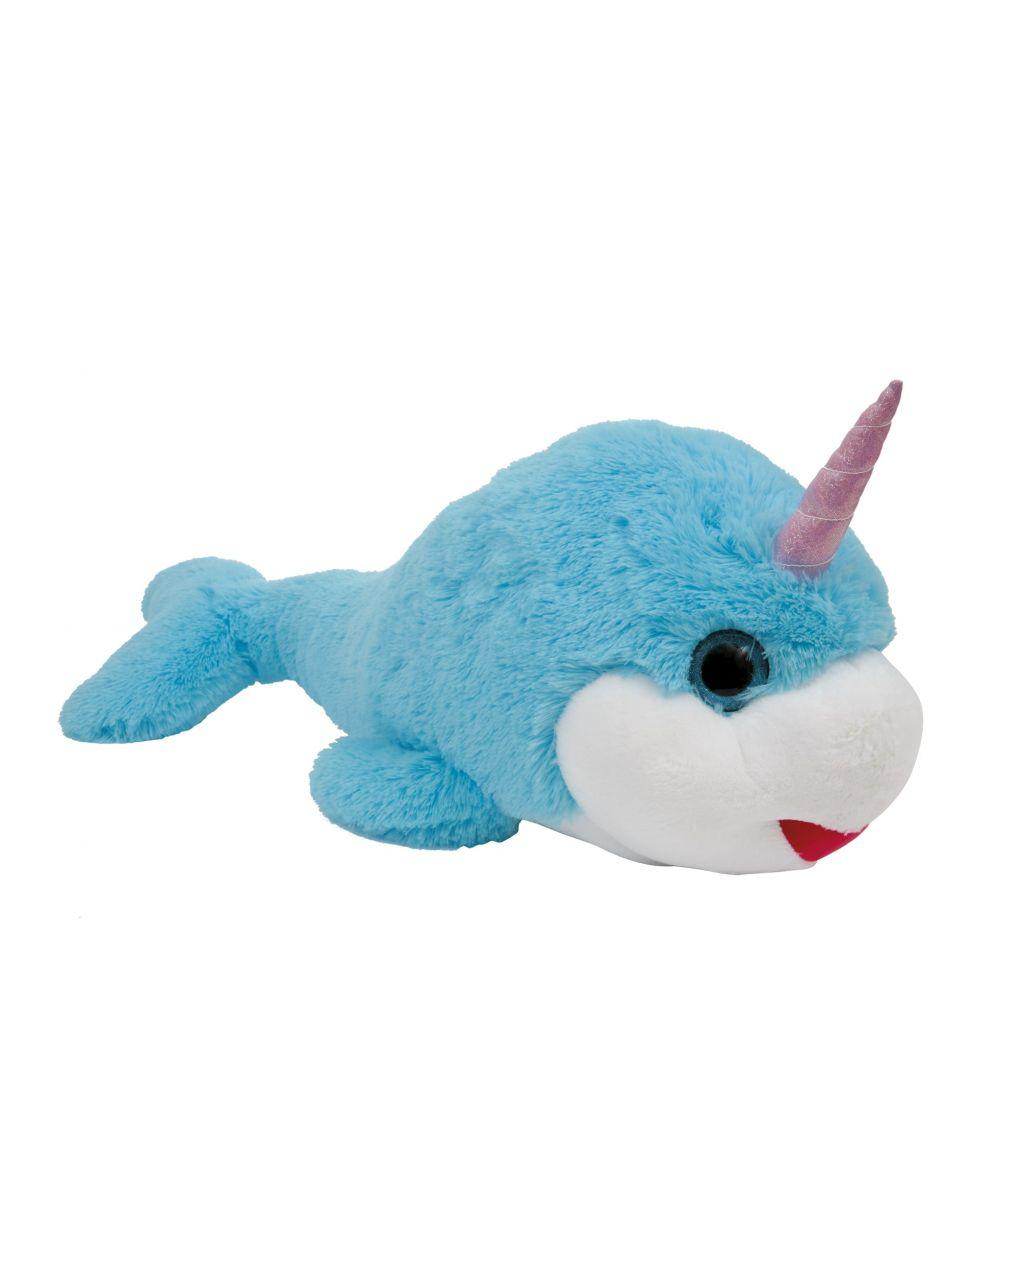 Ami plush  - peluche narvalo unicorno 70cm - Ami Plush